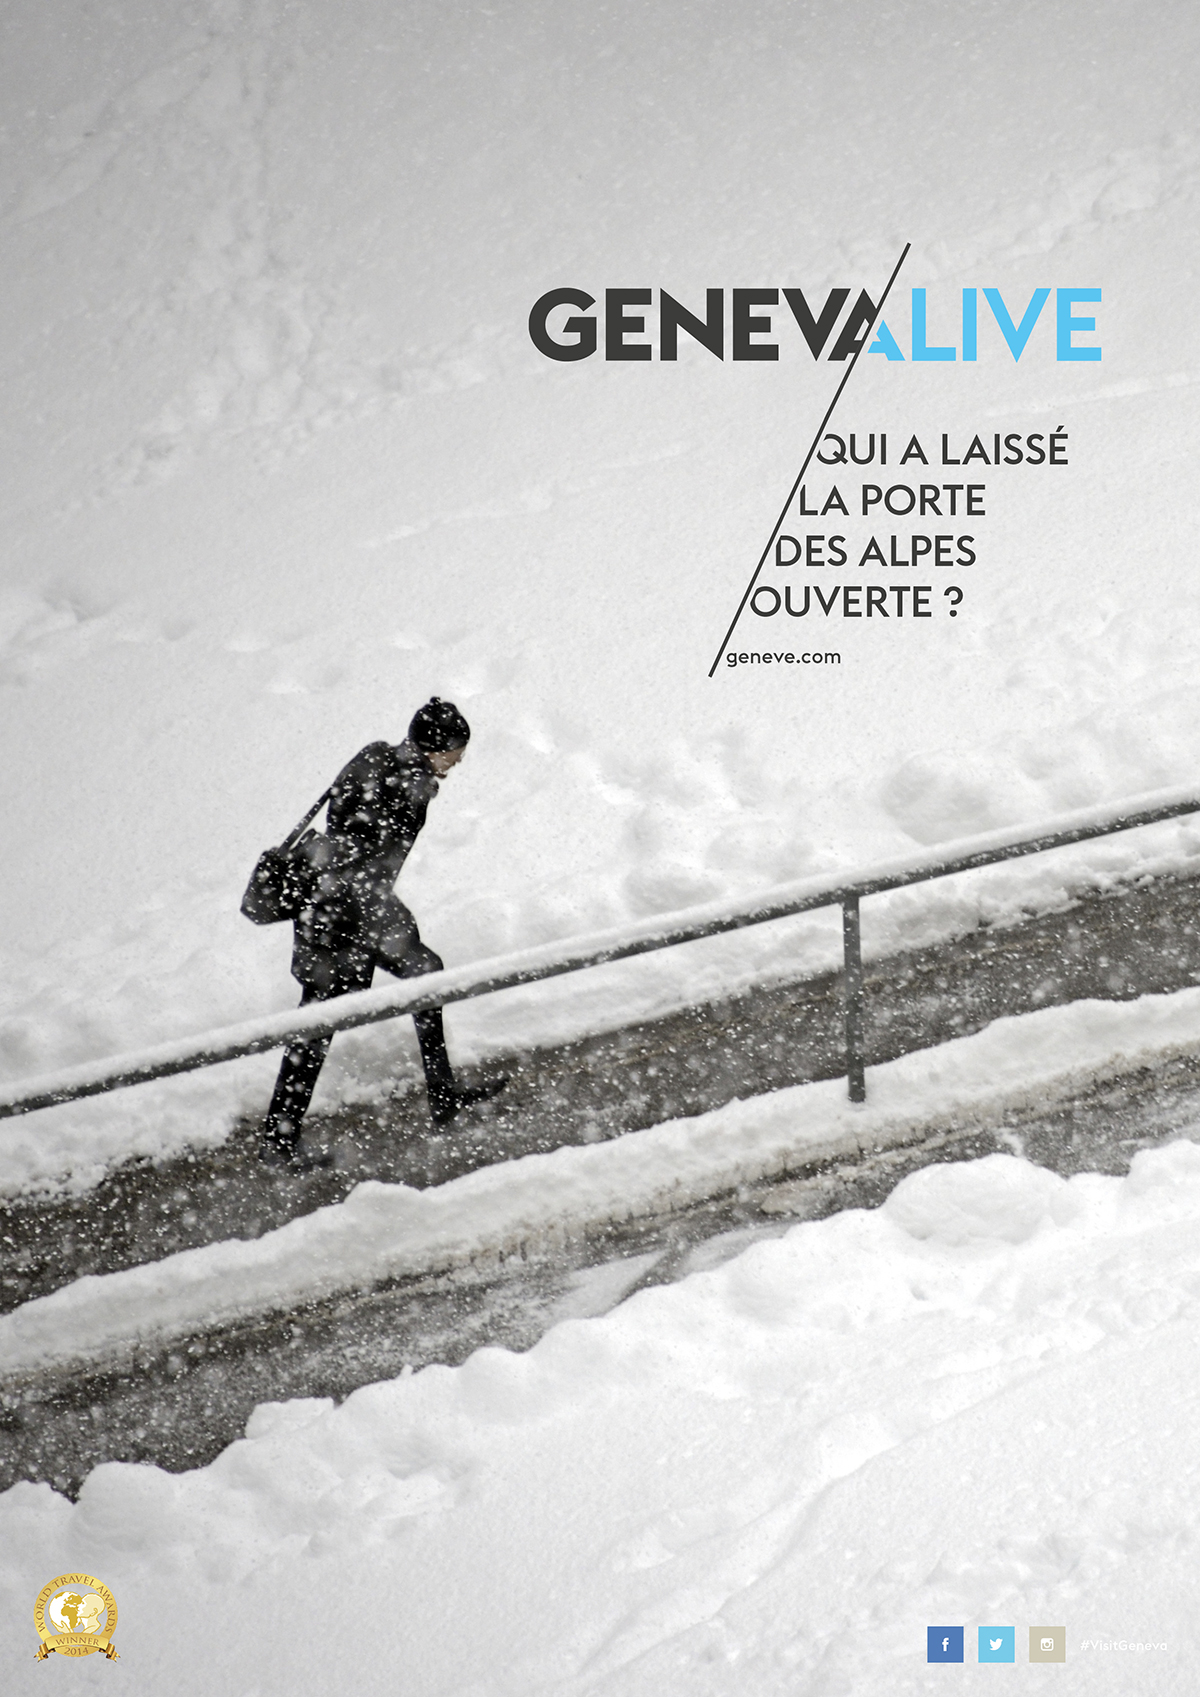 GENEVALIVE_Annonces_A42.jpg